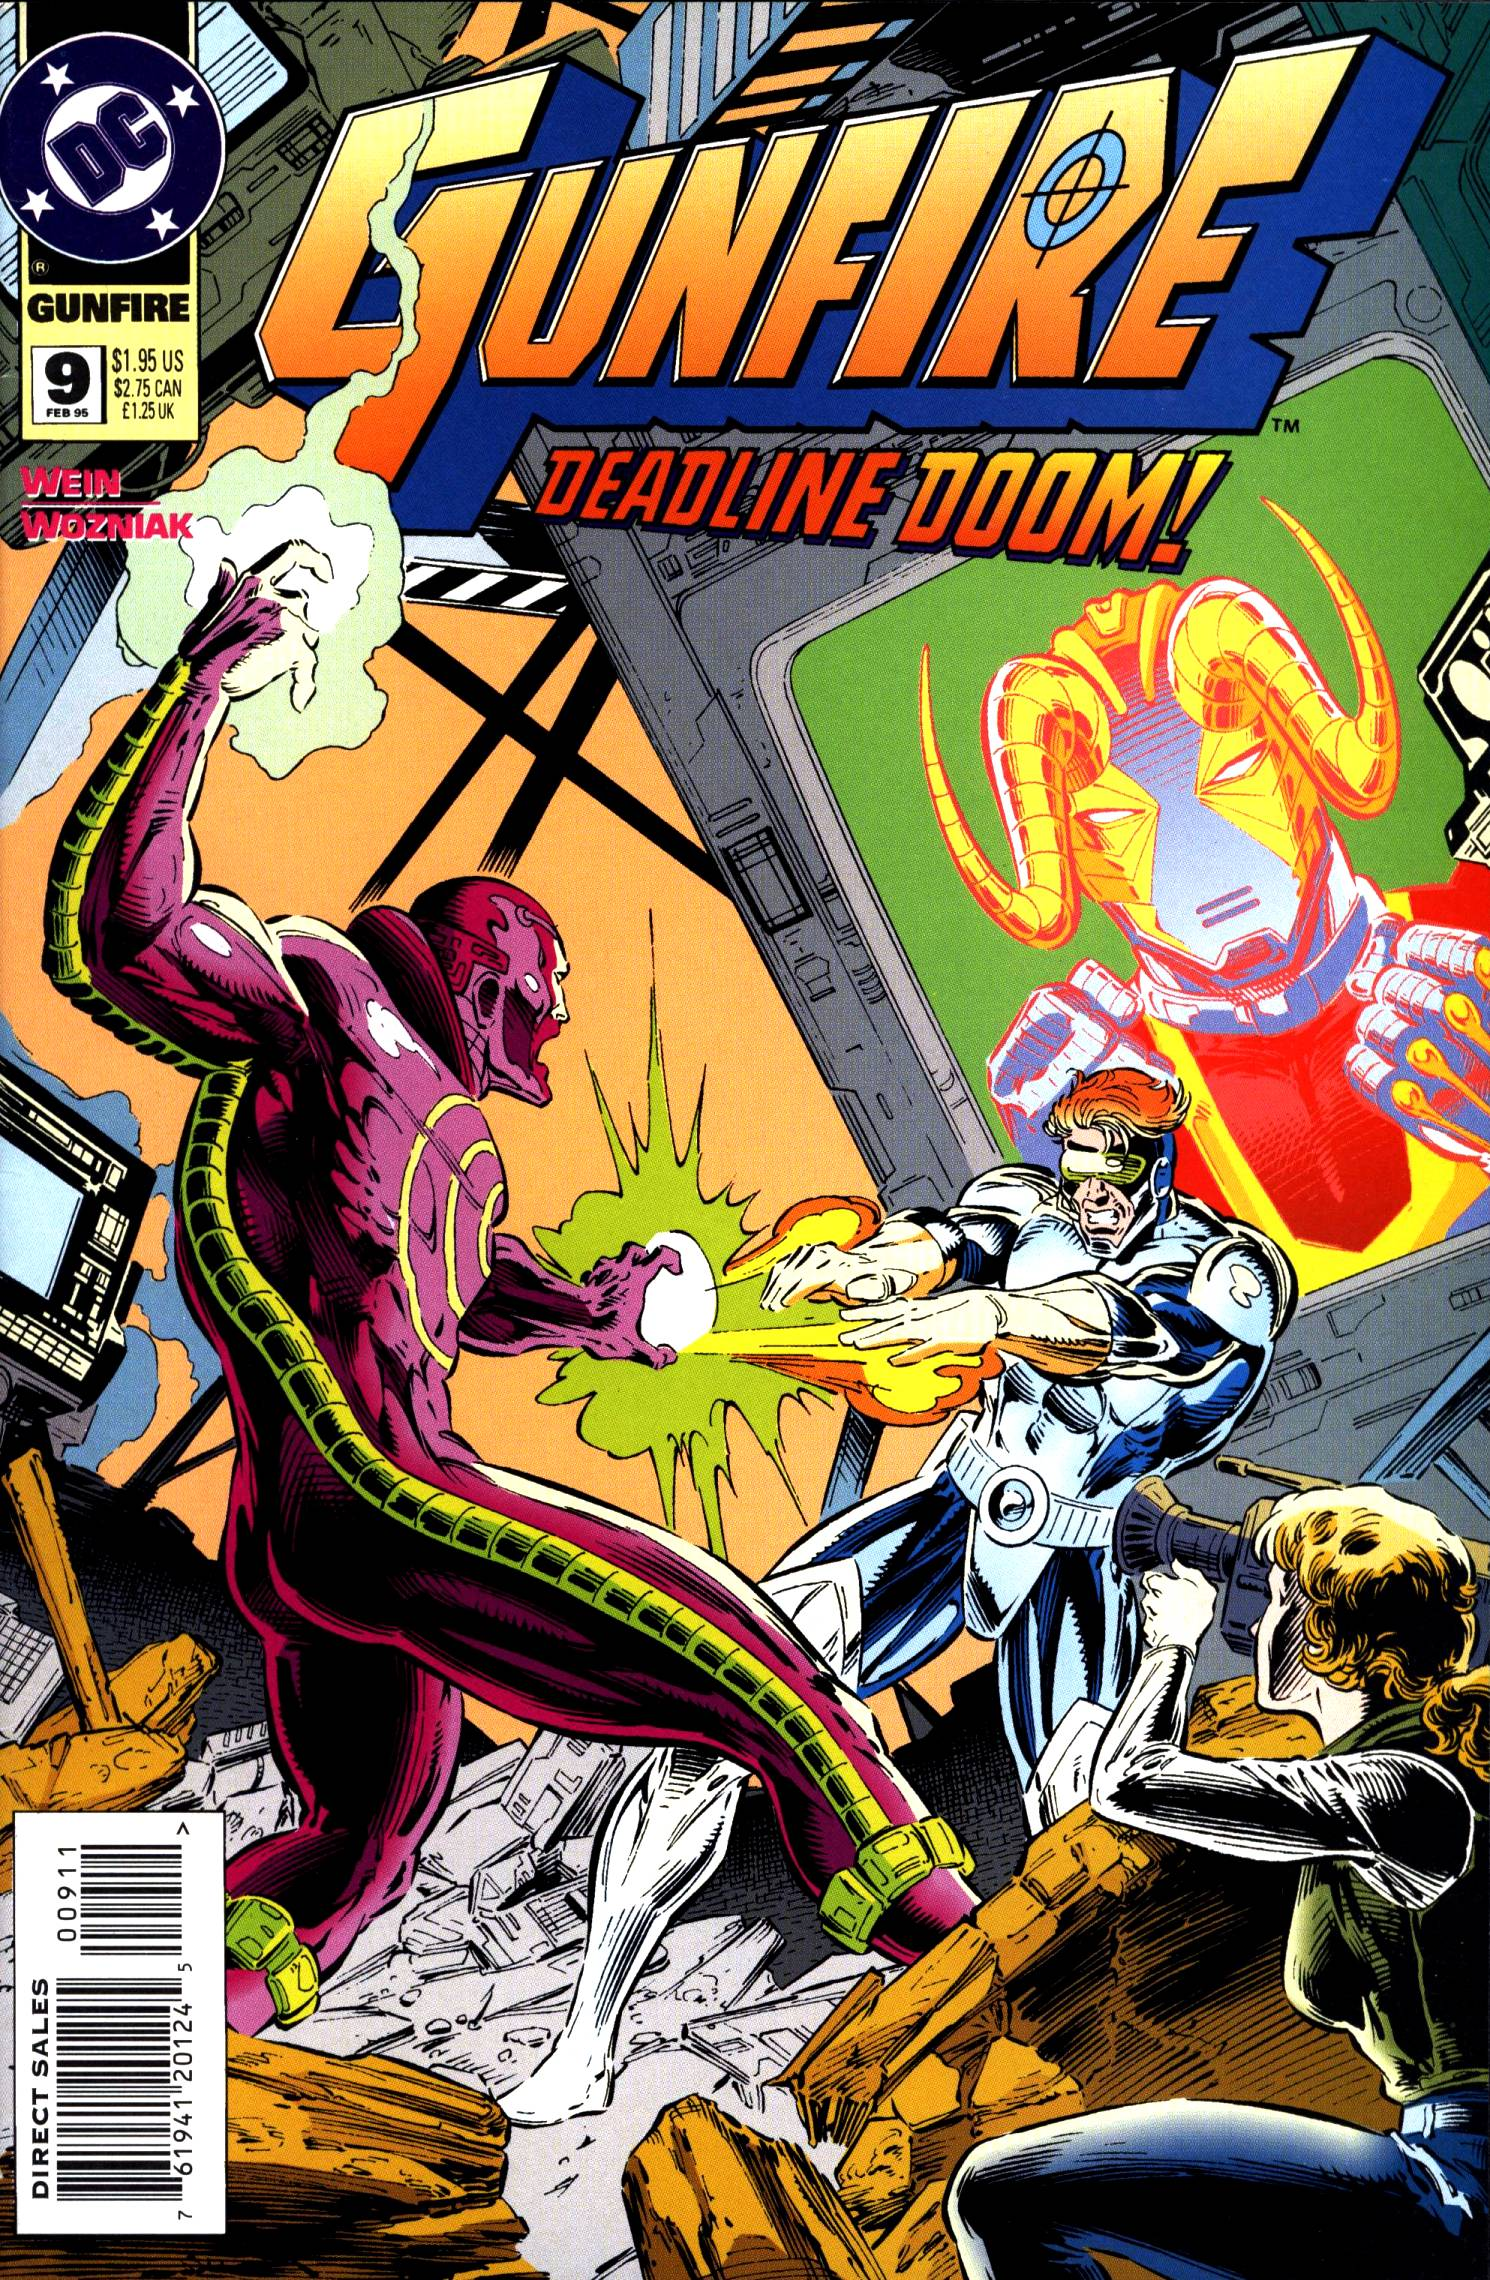 Read online Gunfire comic -  Issue #9 - 1